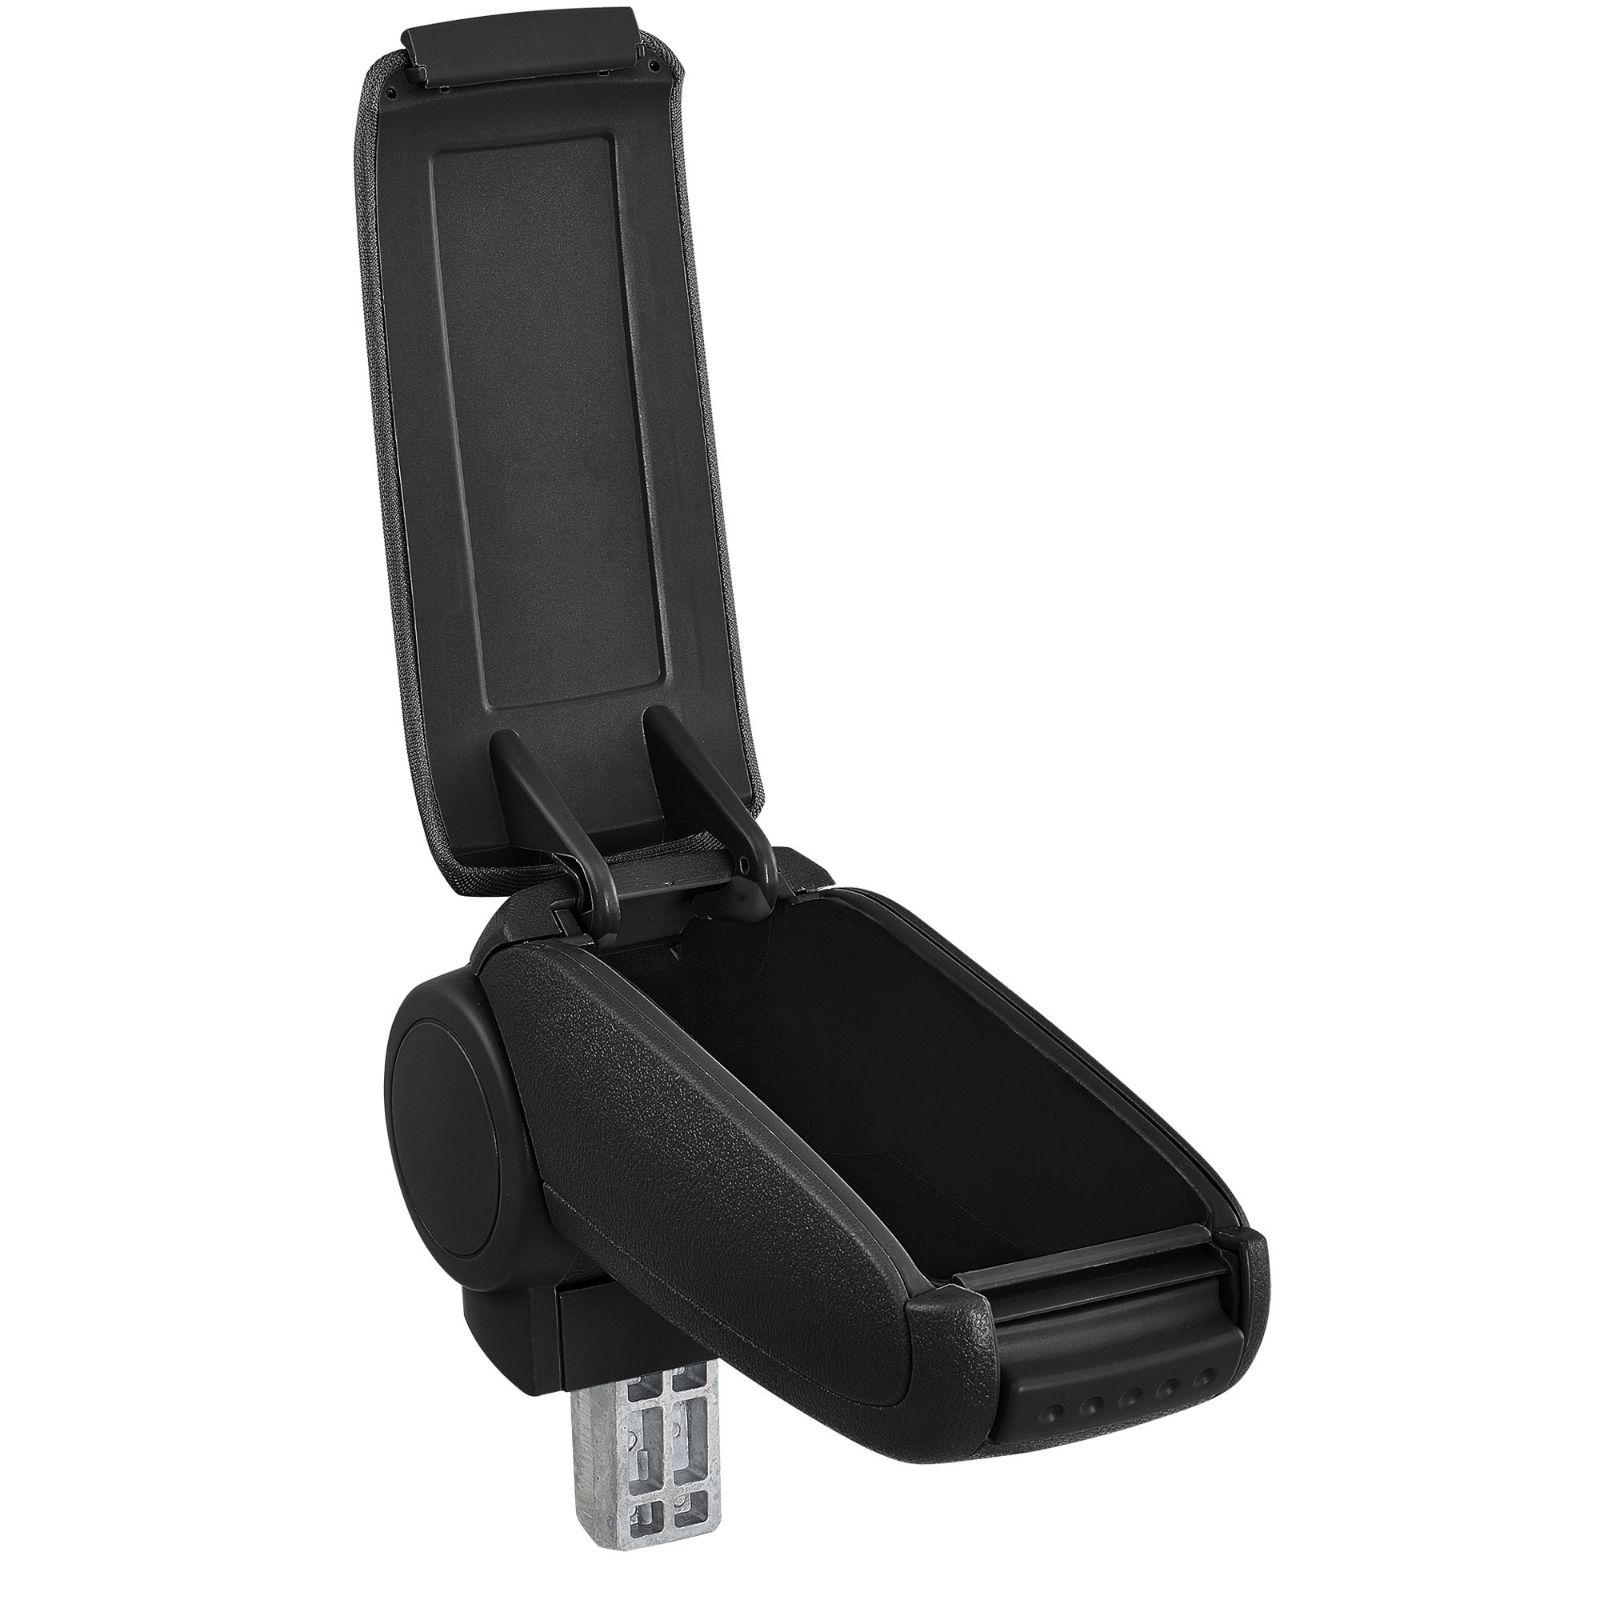 accoudoir neuf peugeot 207 207 cc 207 sw cuir noir ebay. Black Bedroom Furniture Sets. Home Design Ideas